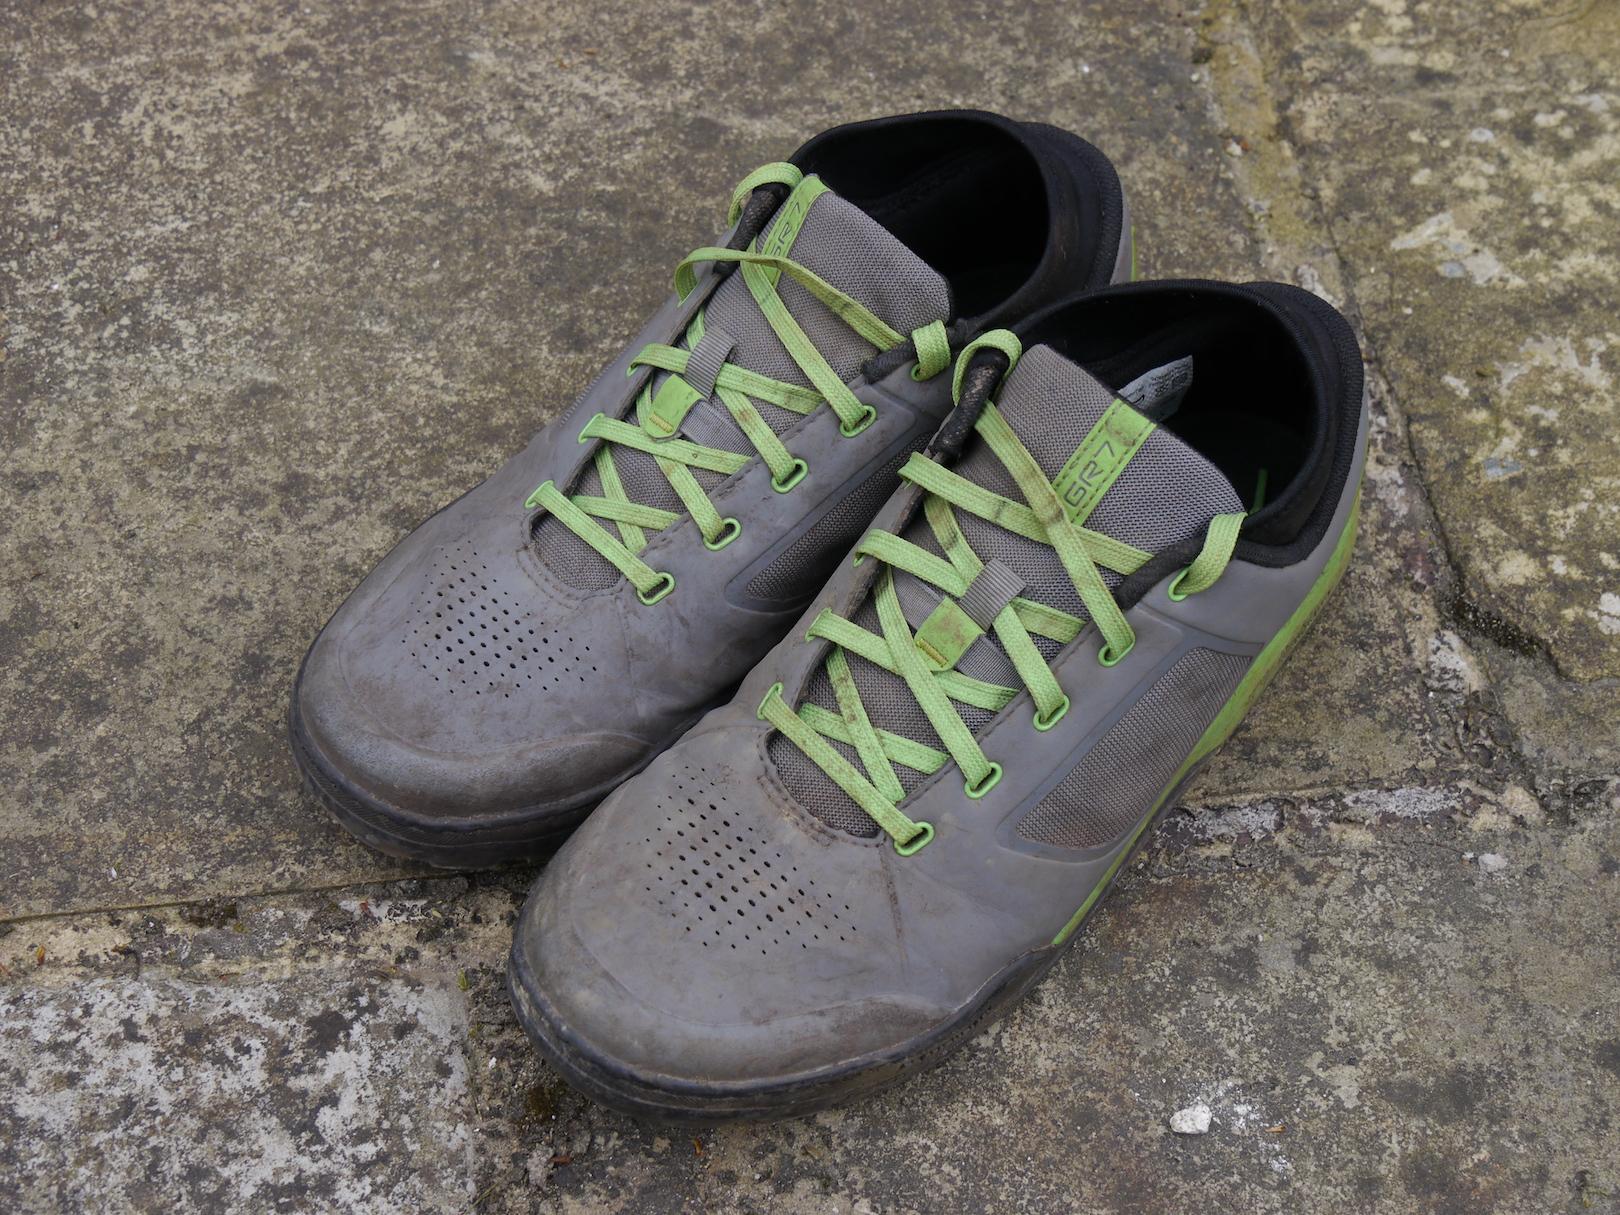 c7d21cc17cdb Review  Shimano GR7 vs GR9 Flat Pedal Shoes - Singletrack Magazine